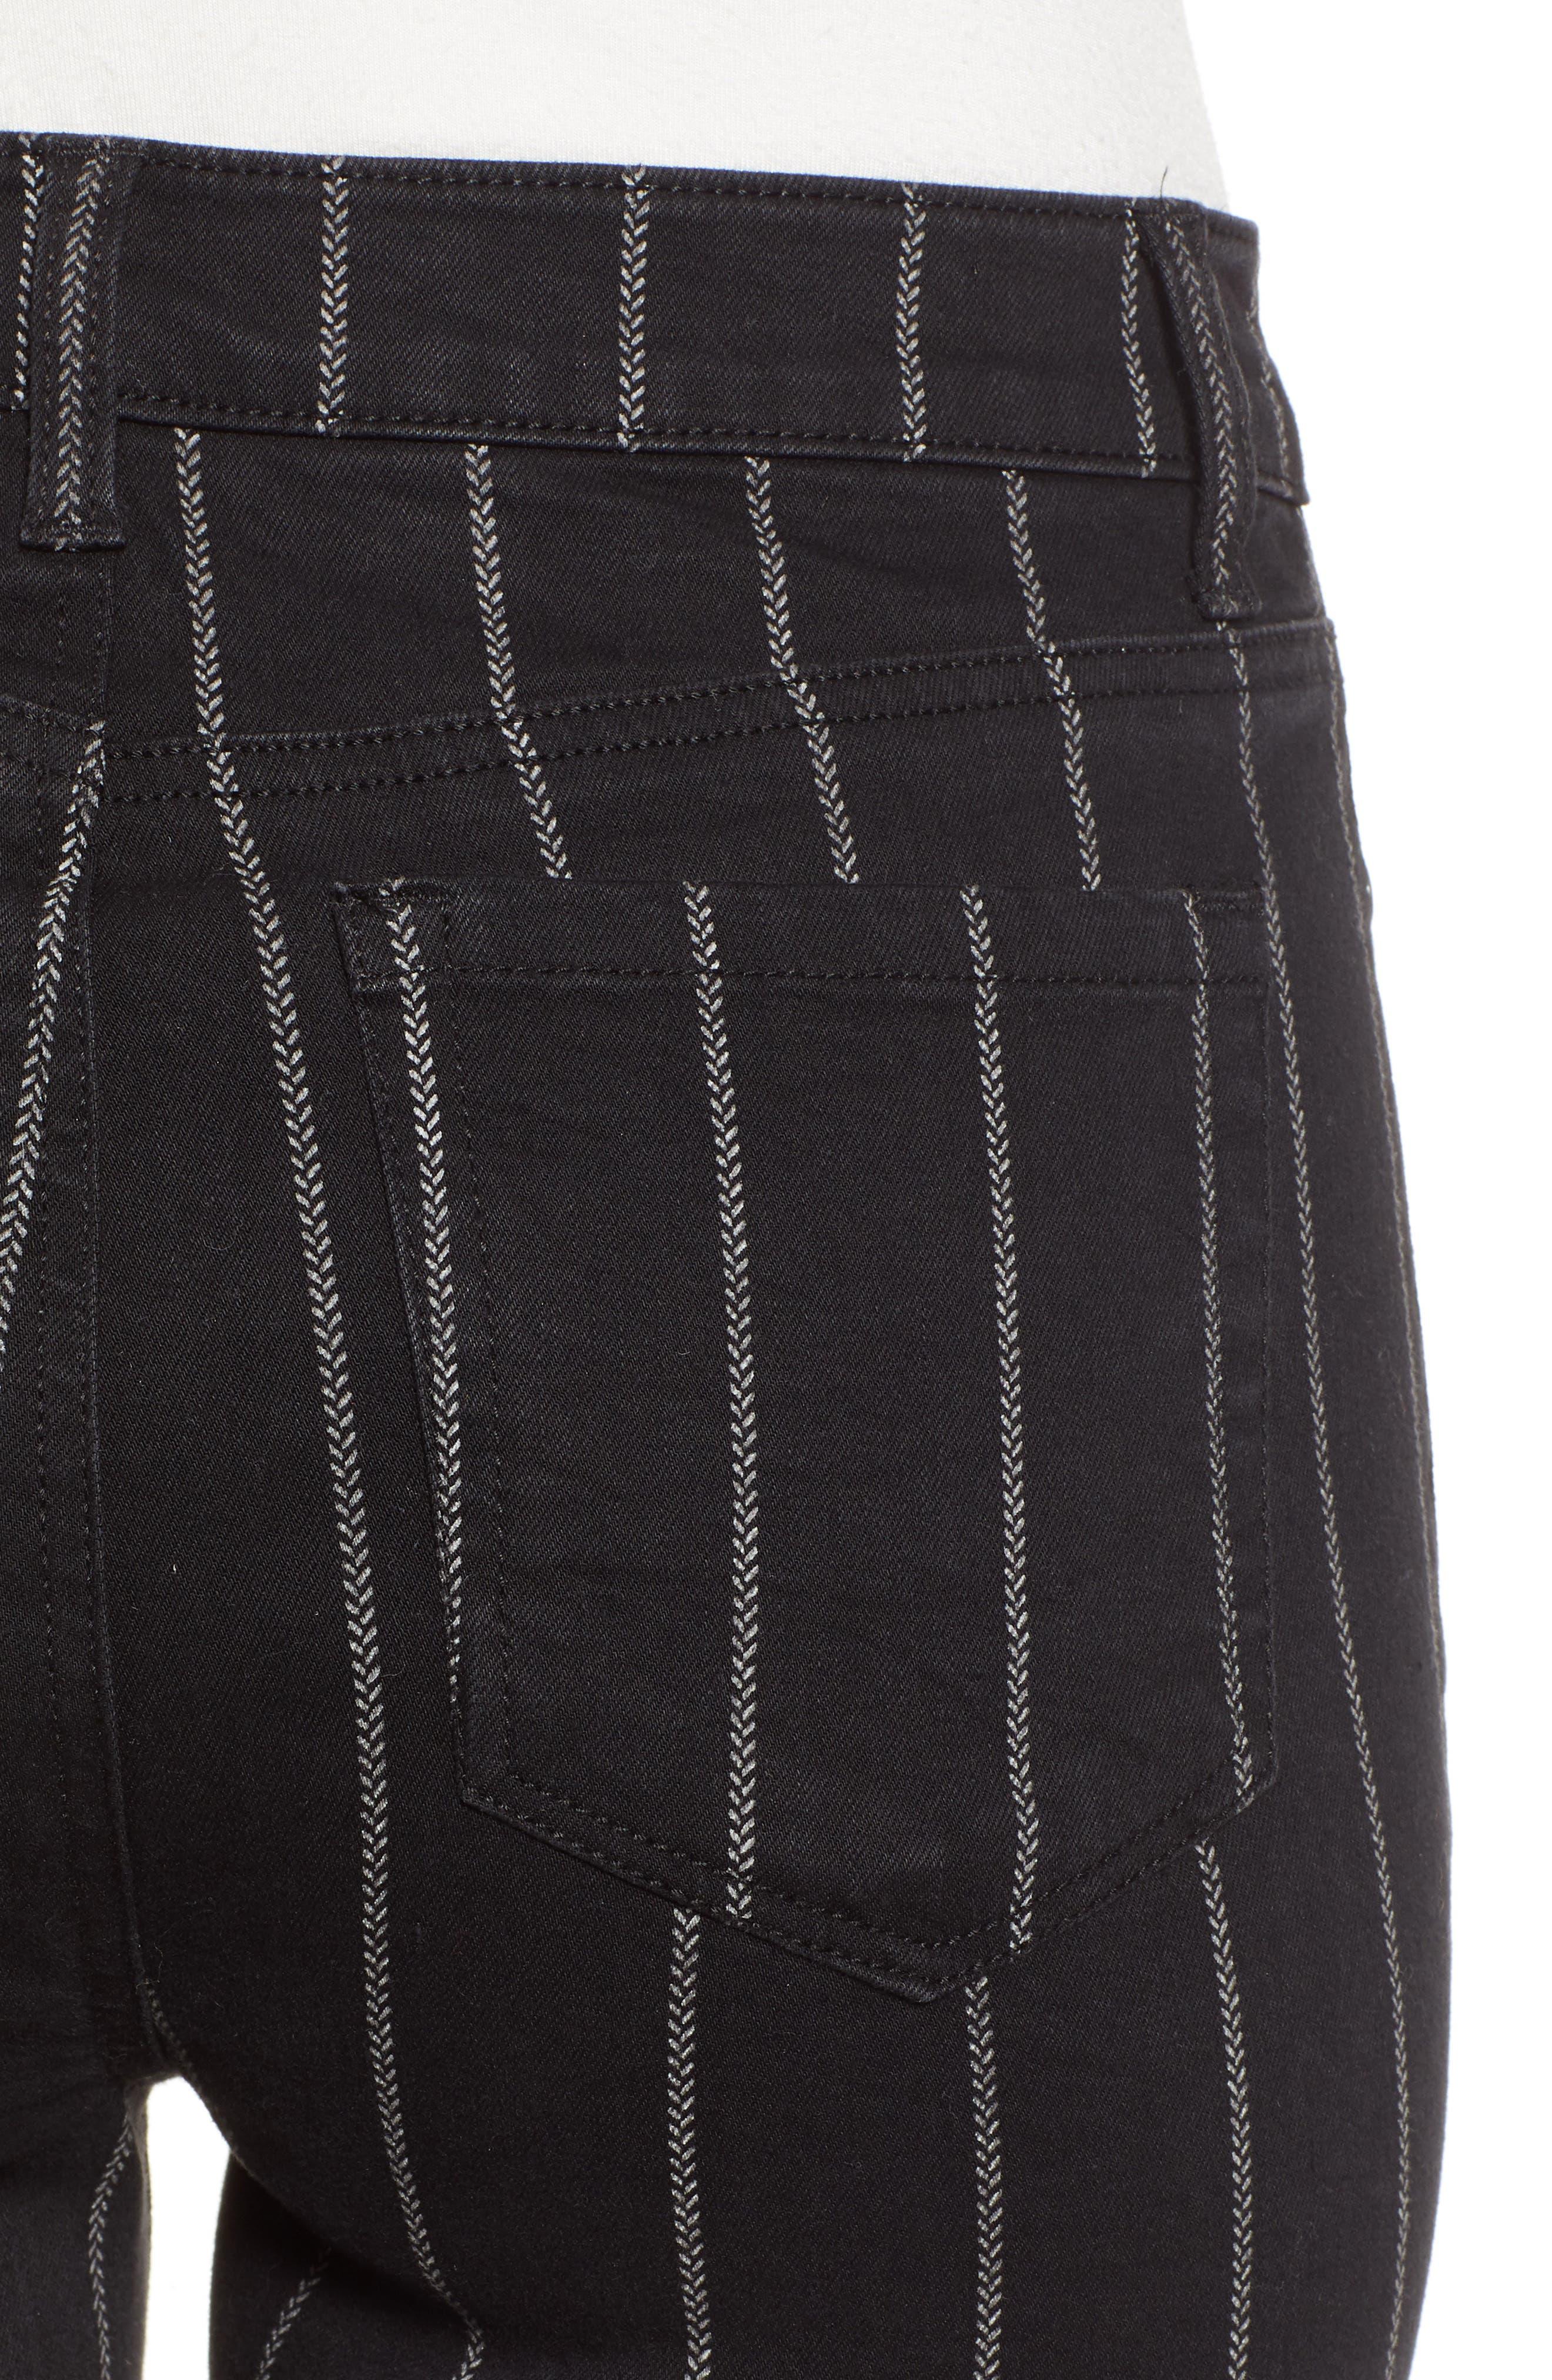 TINSEL, Stripe High Rise Skinny Jeans, Alternate thumbnail 5, color, 001